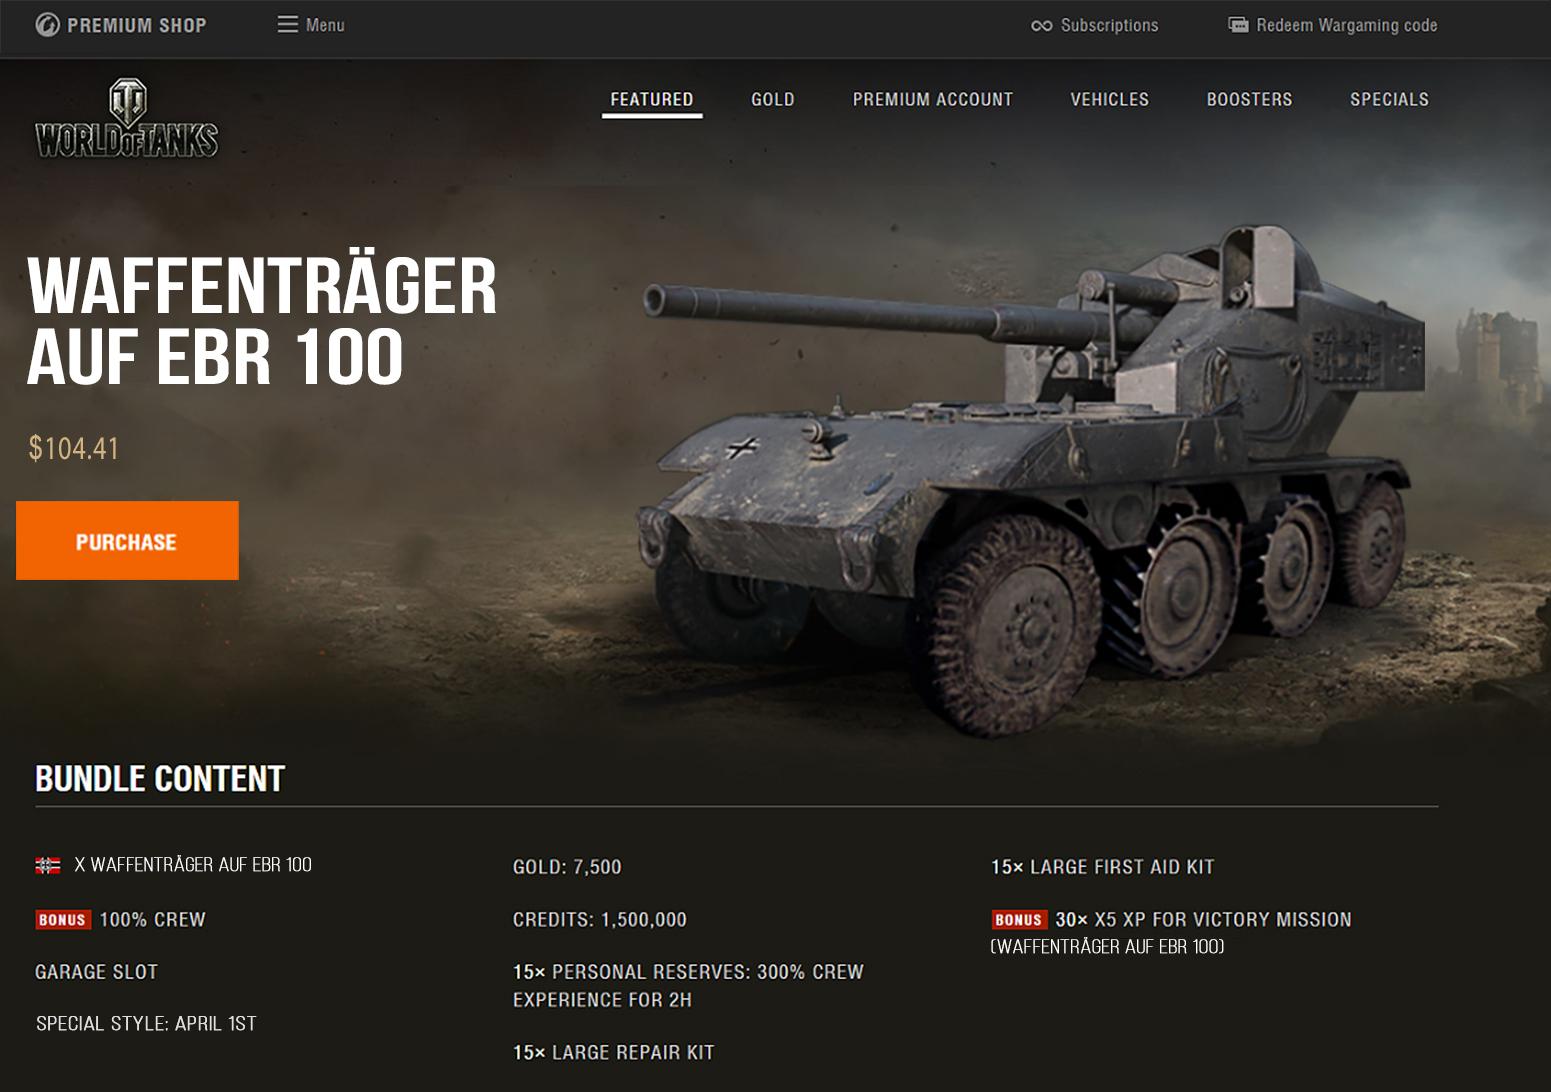 World-of-Tanks-Waffentrager-auf-ebr-100-April-Fools